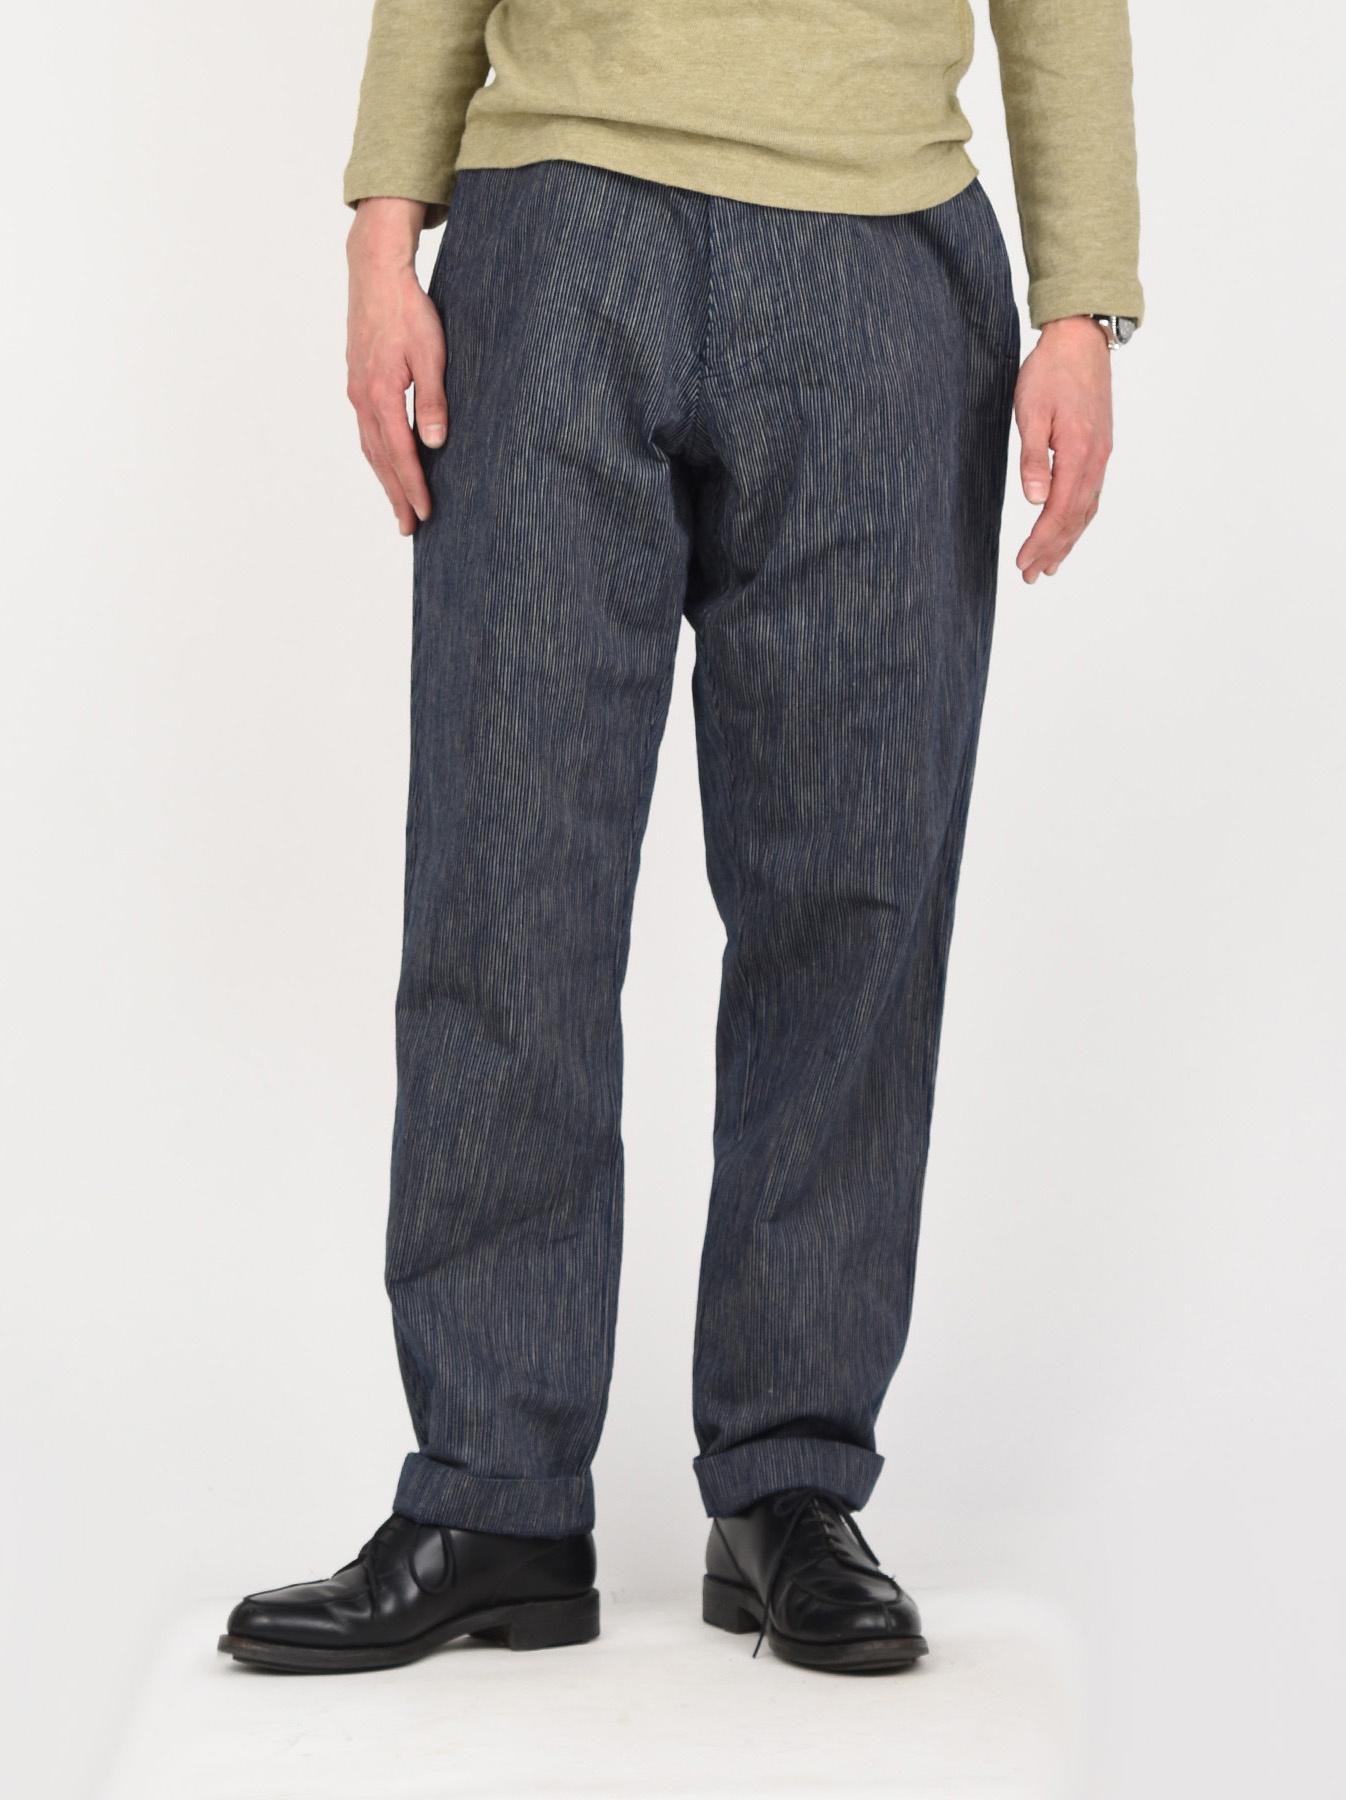 WH Indigo Mugi Yoko-shusi Work Pants-3